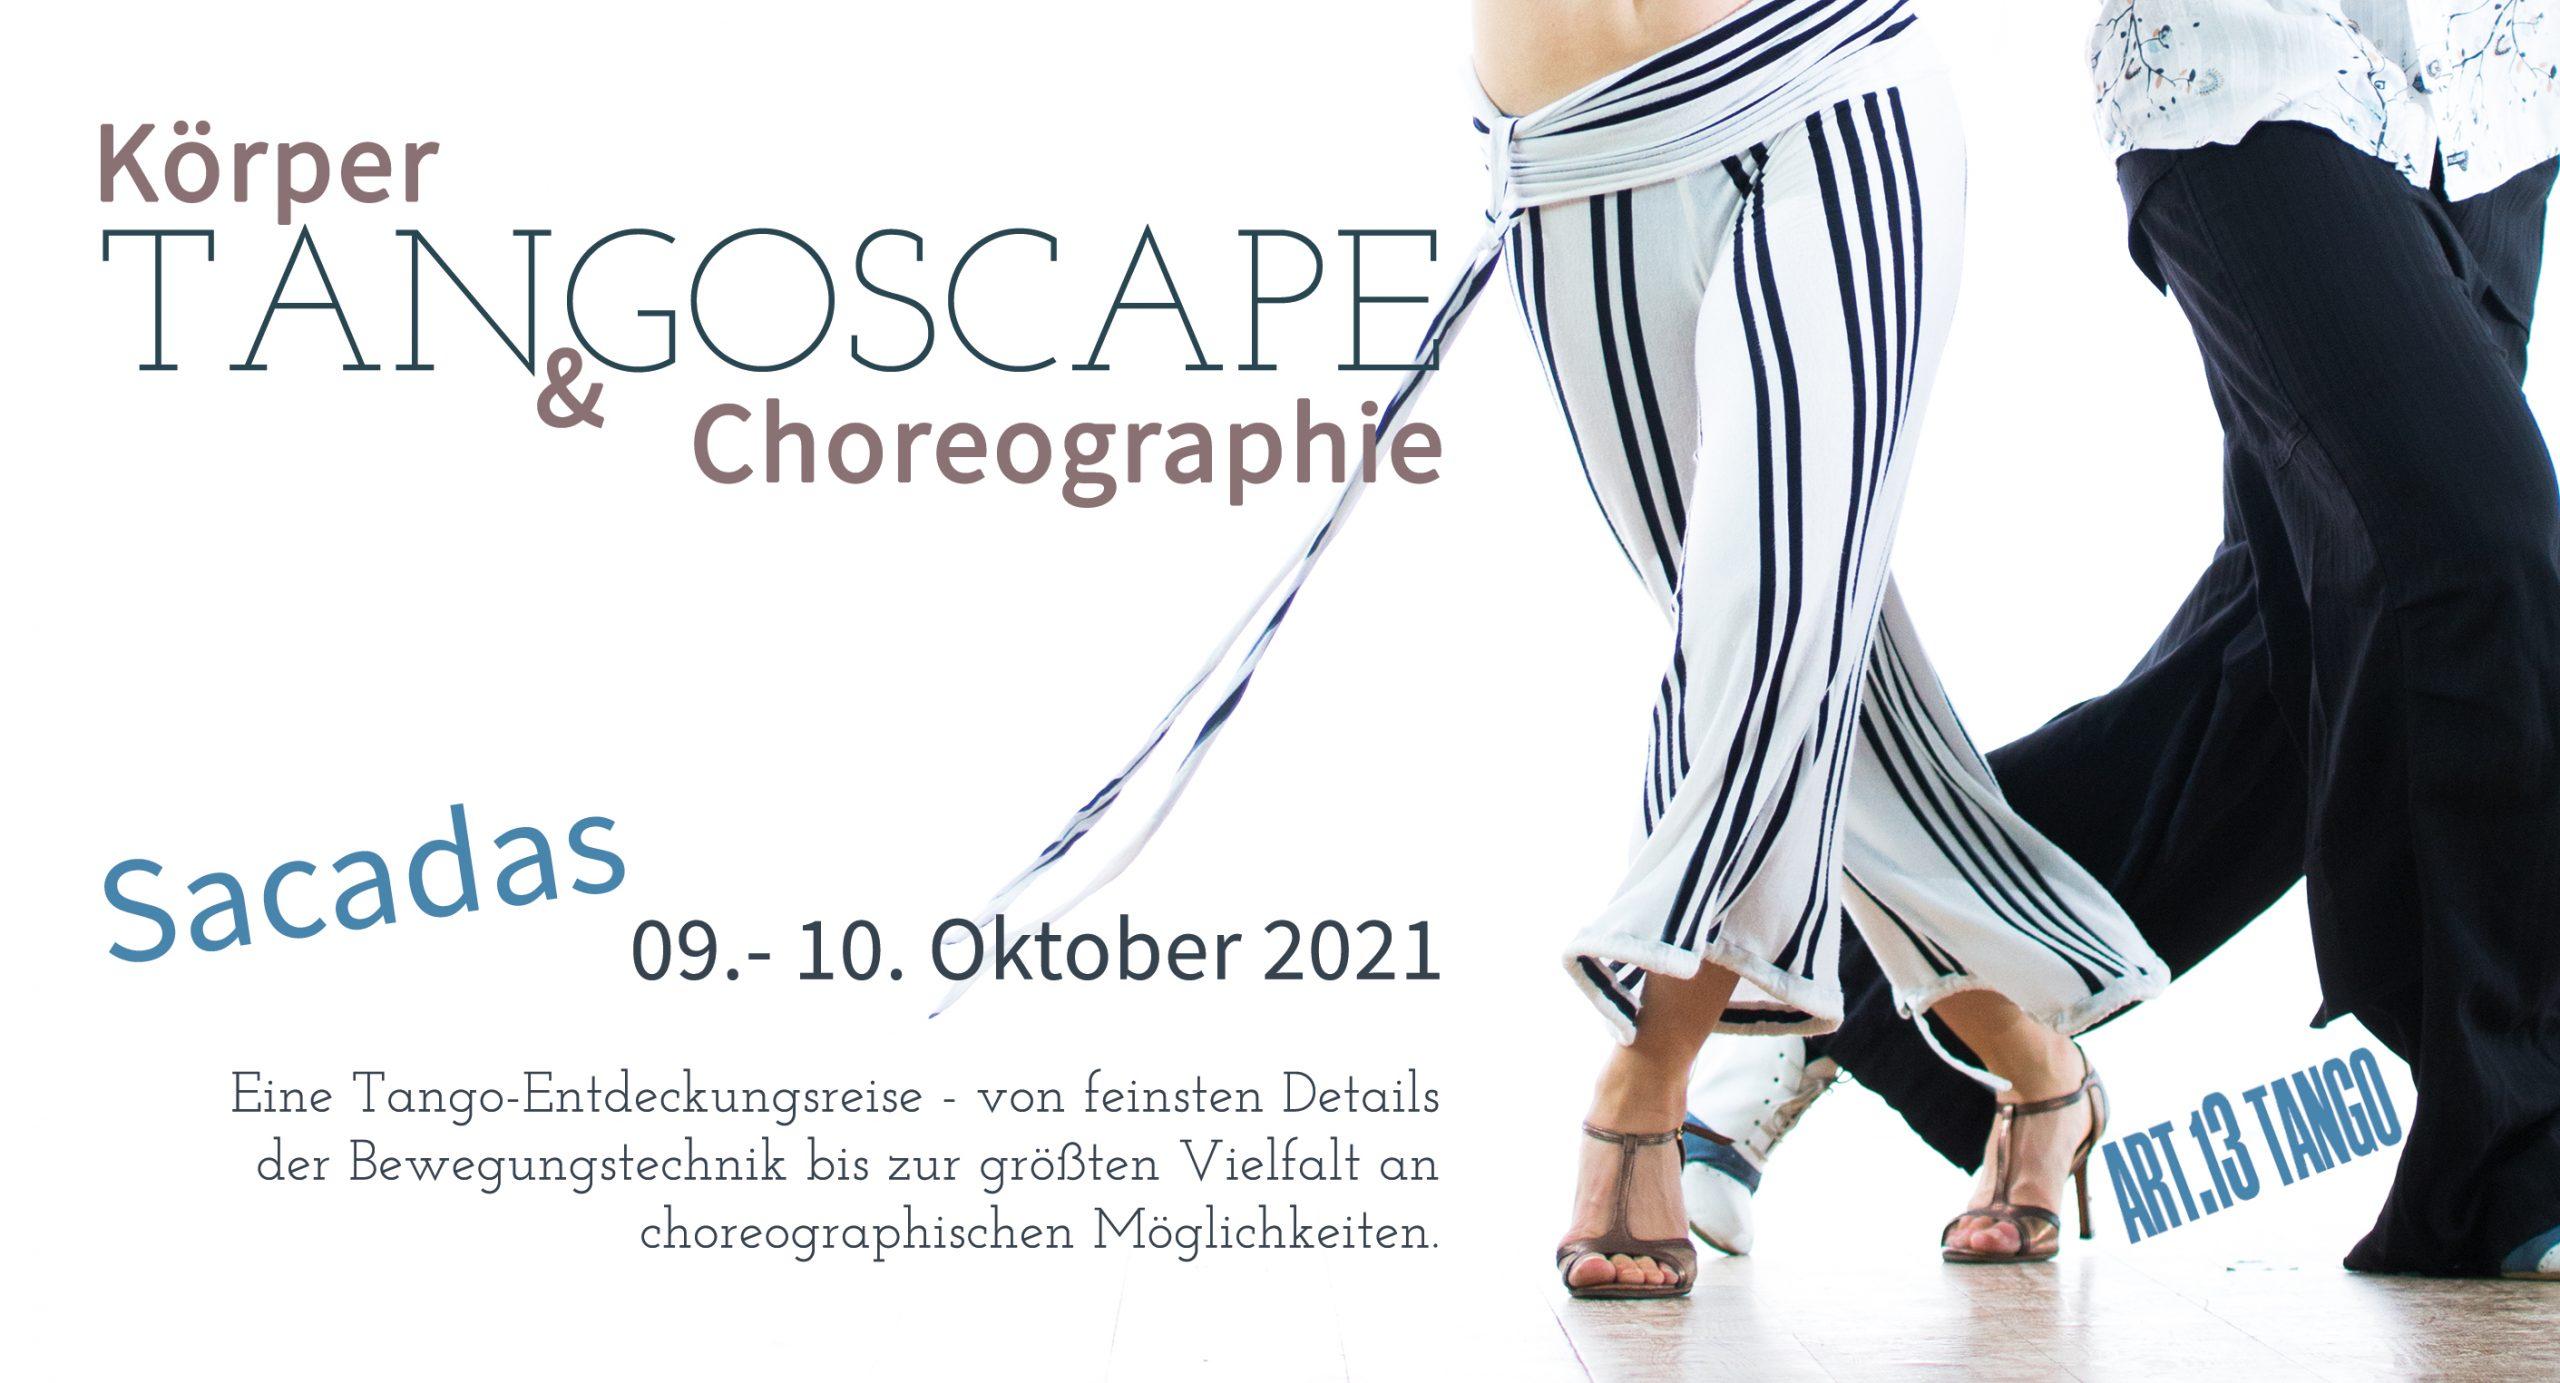 TANGOSCAPE: Körper & Choreographie   Sacadas   Workshop im LA BERLINESA